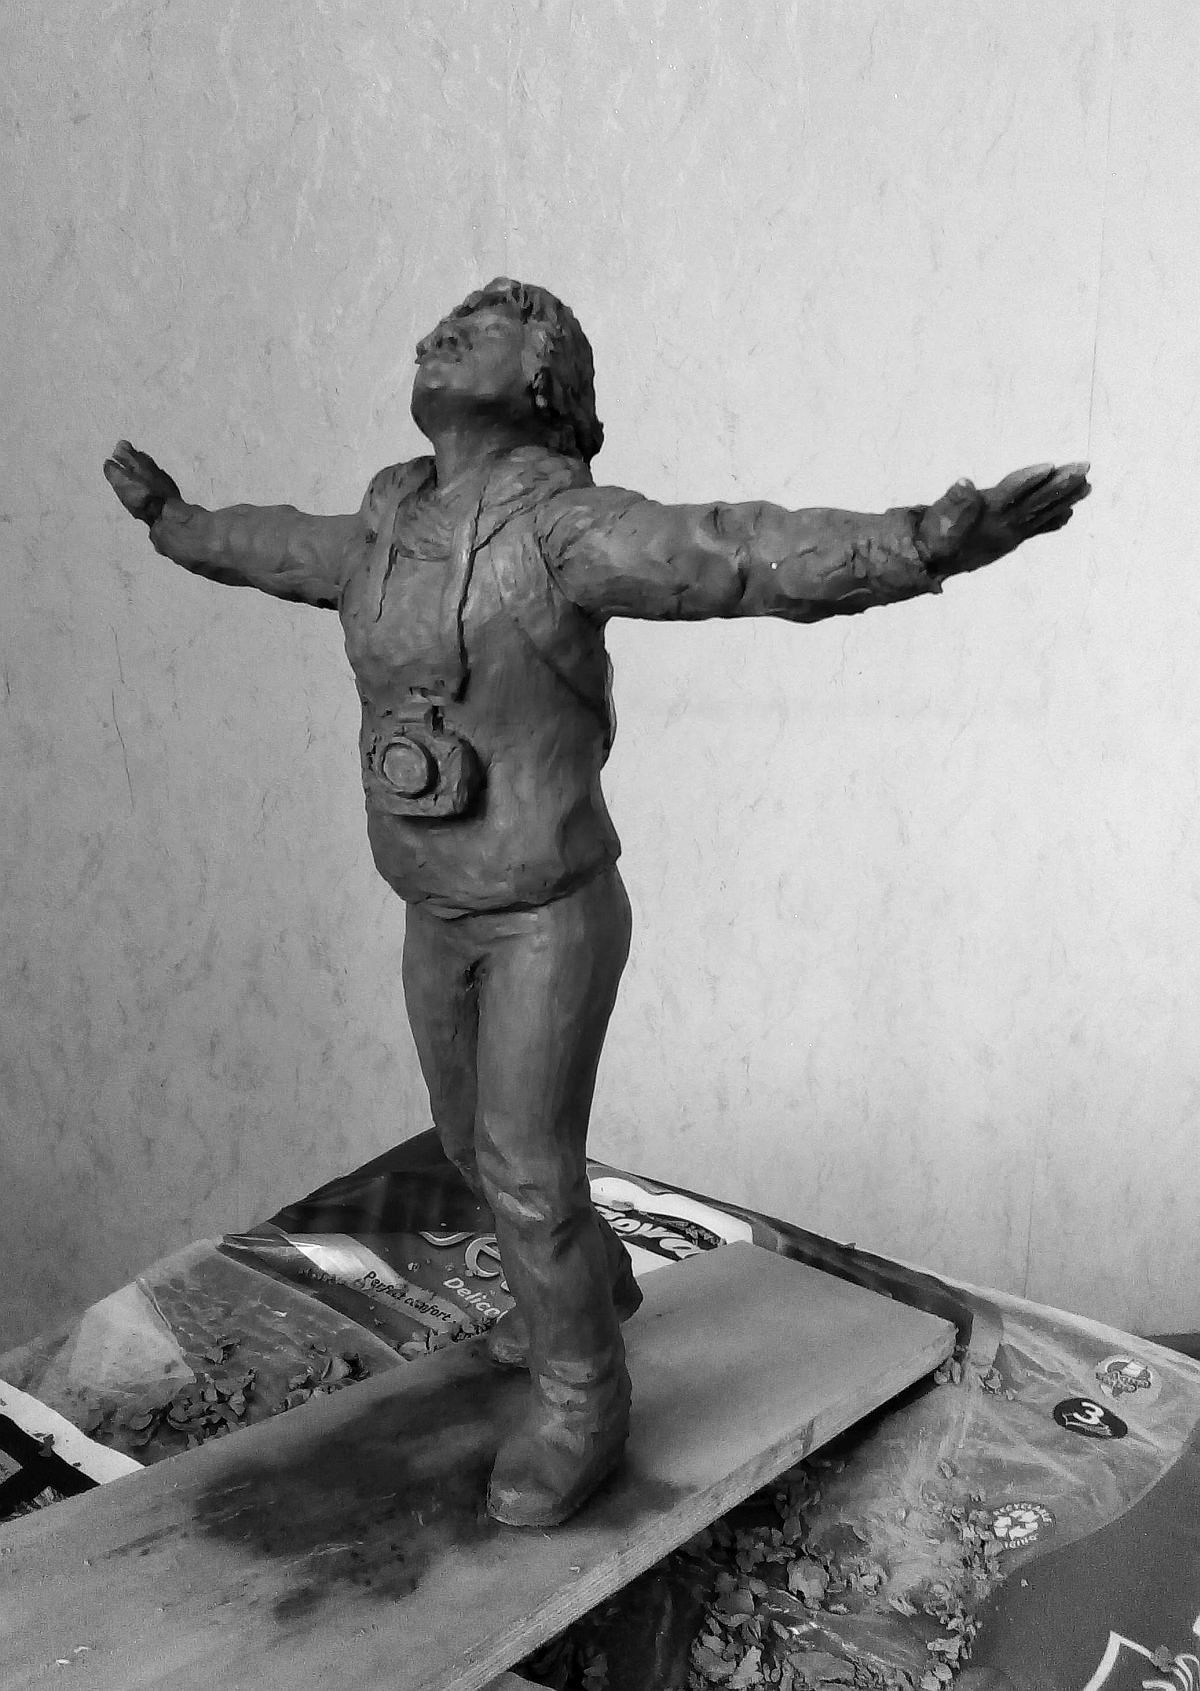 Эскиз памятника Ирине Славиной. Глина, 25 см. © Виктор Корб, 2021. Вид в три четверти, слева, спереди.